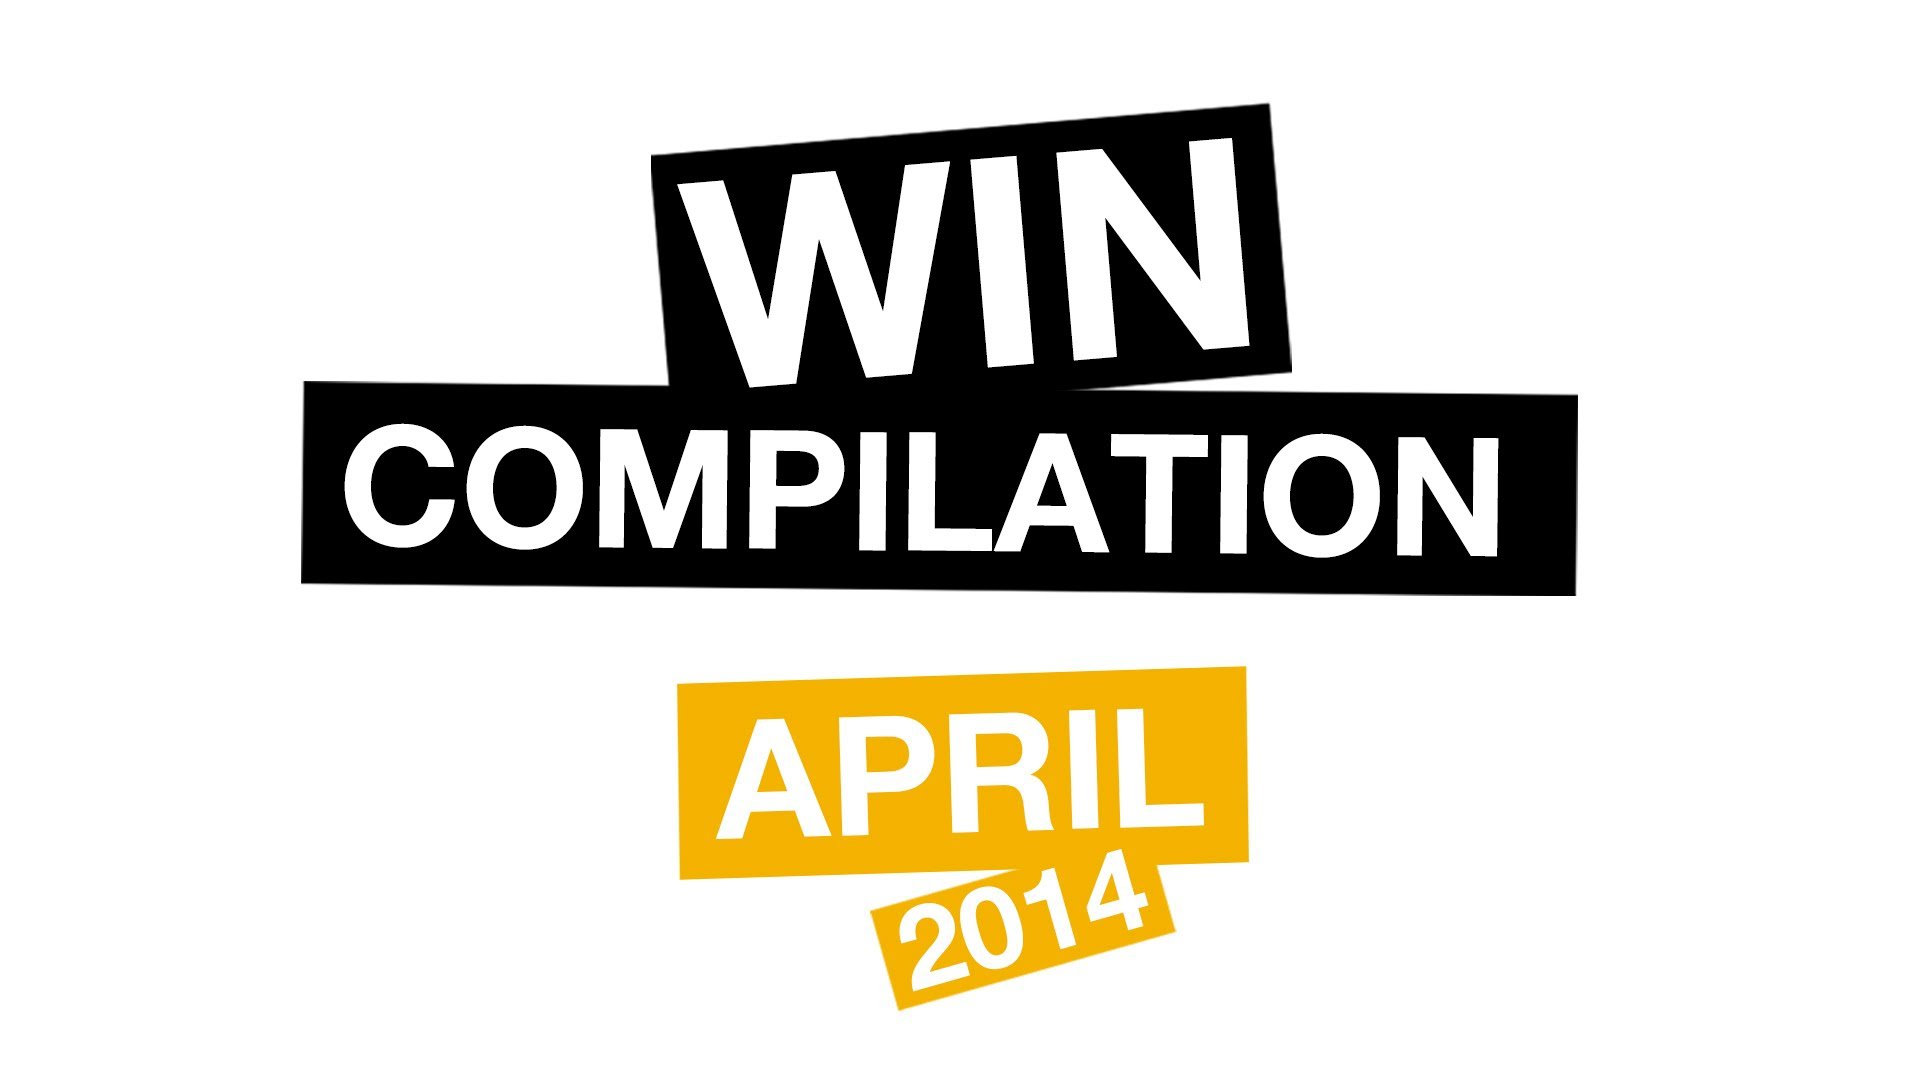 WIN Compilation April 2014